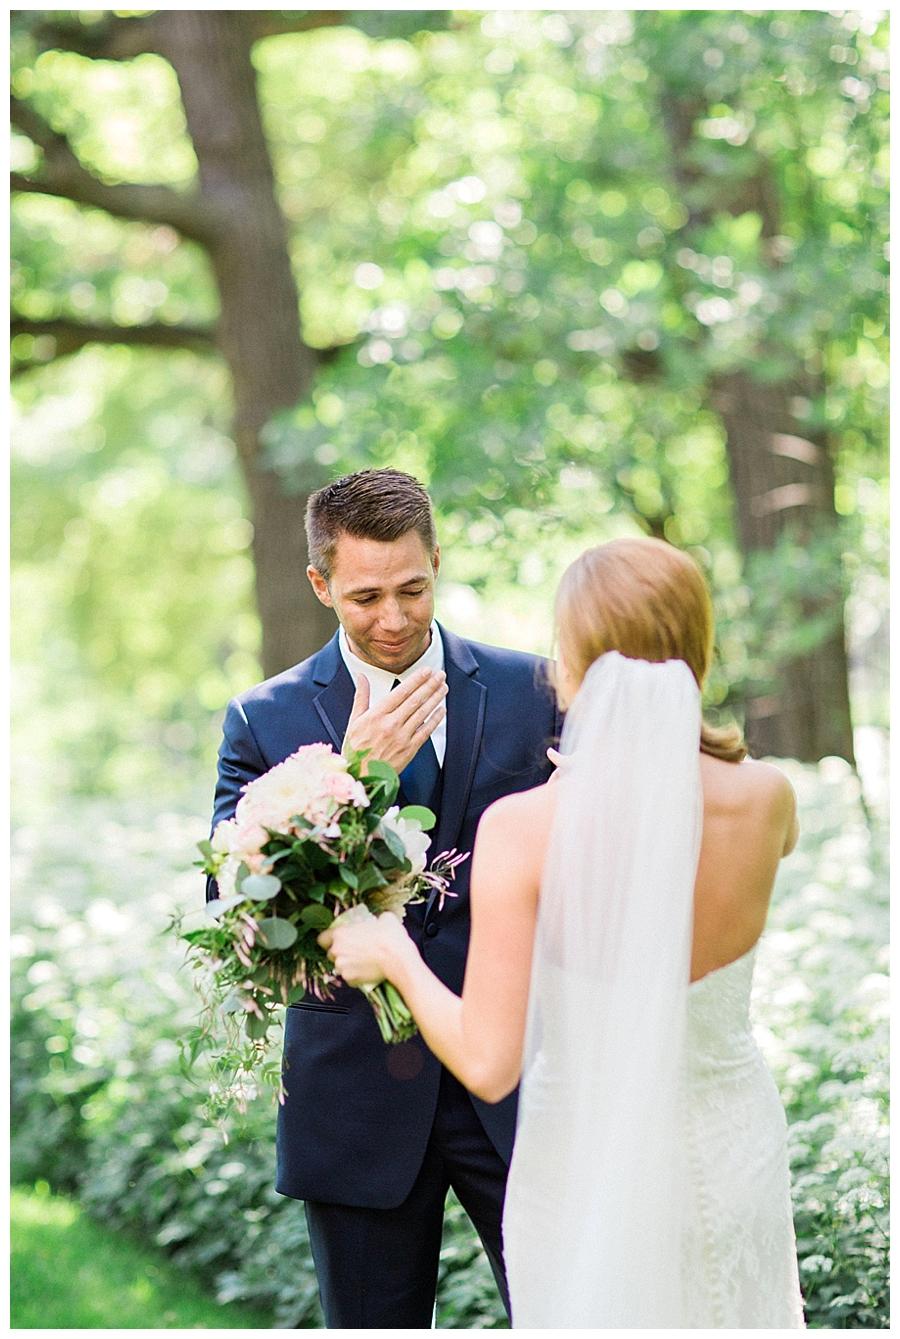 fine art wedding photography at Hyatt Lodge McDonald's Campus in Oak Brook